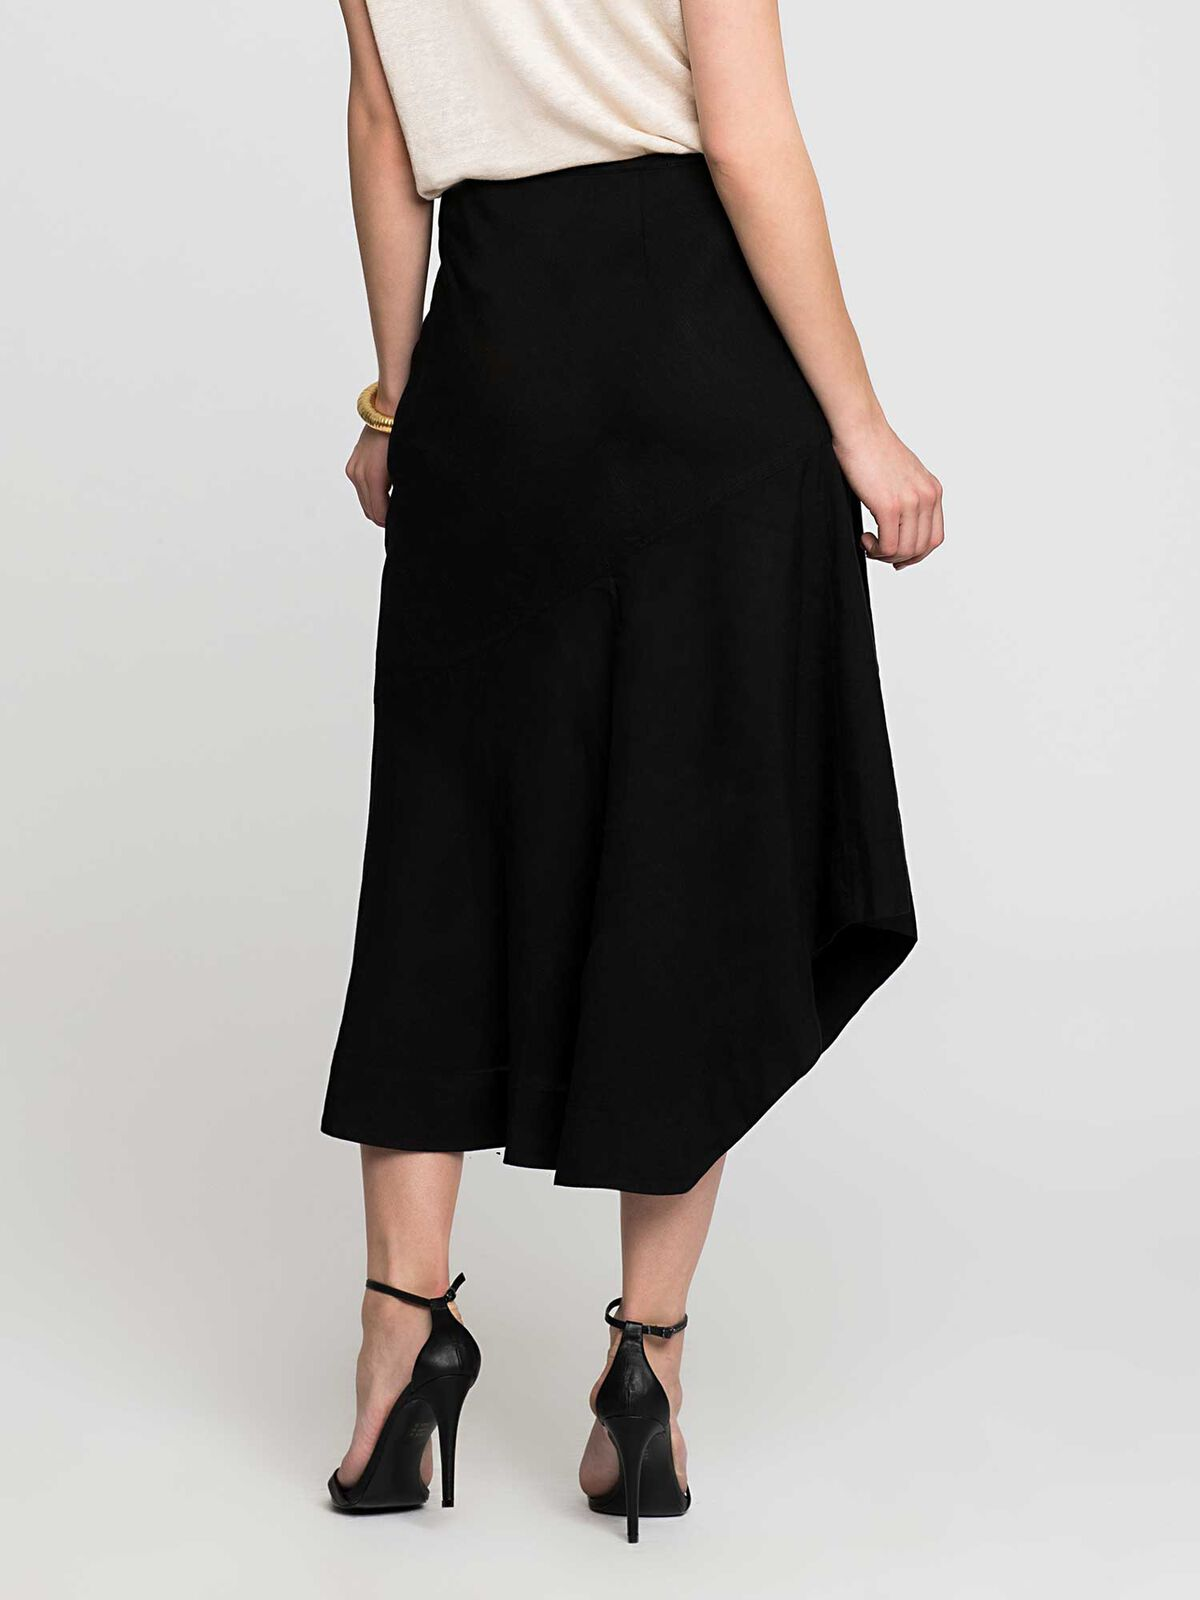 The Long Engagement Skirt